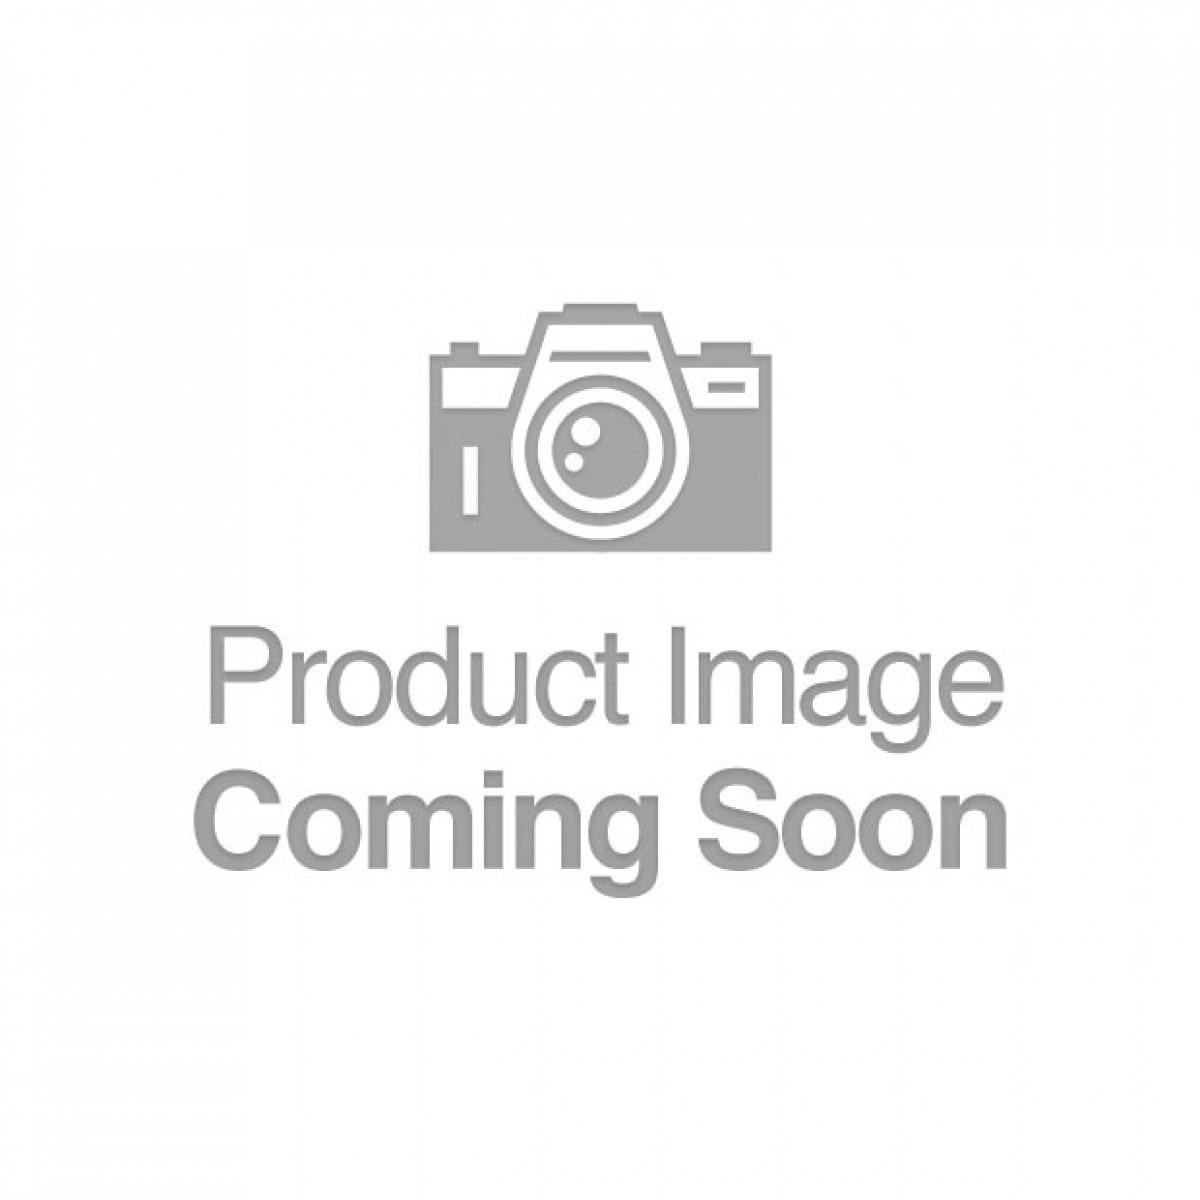 Sensuva Ultra Stimulating ON Insane Personal Moisturizer - 1.93 oz Cinnabun